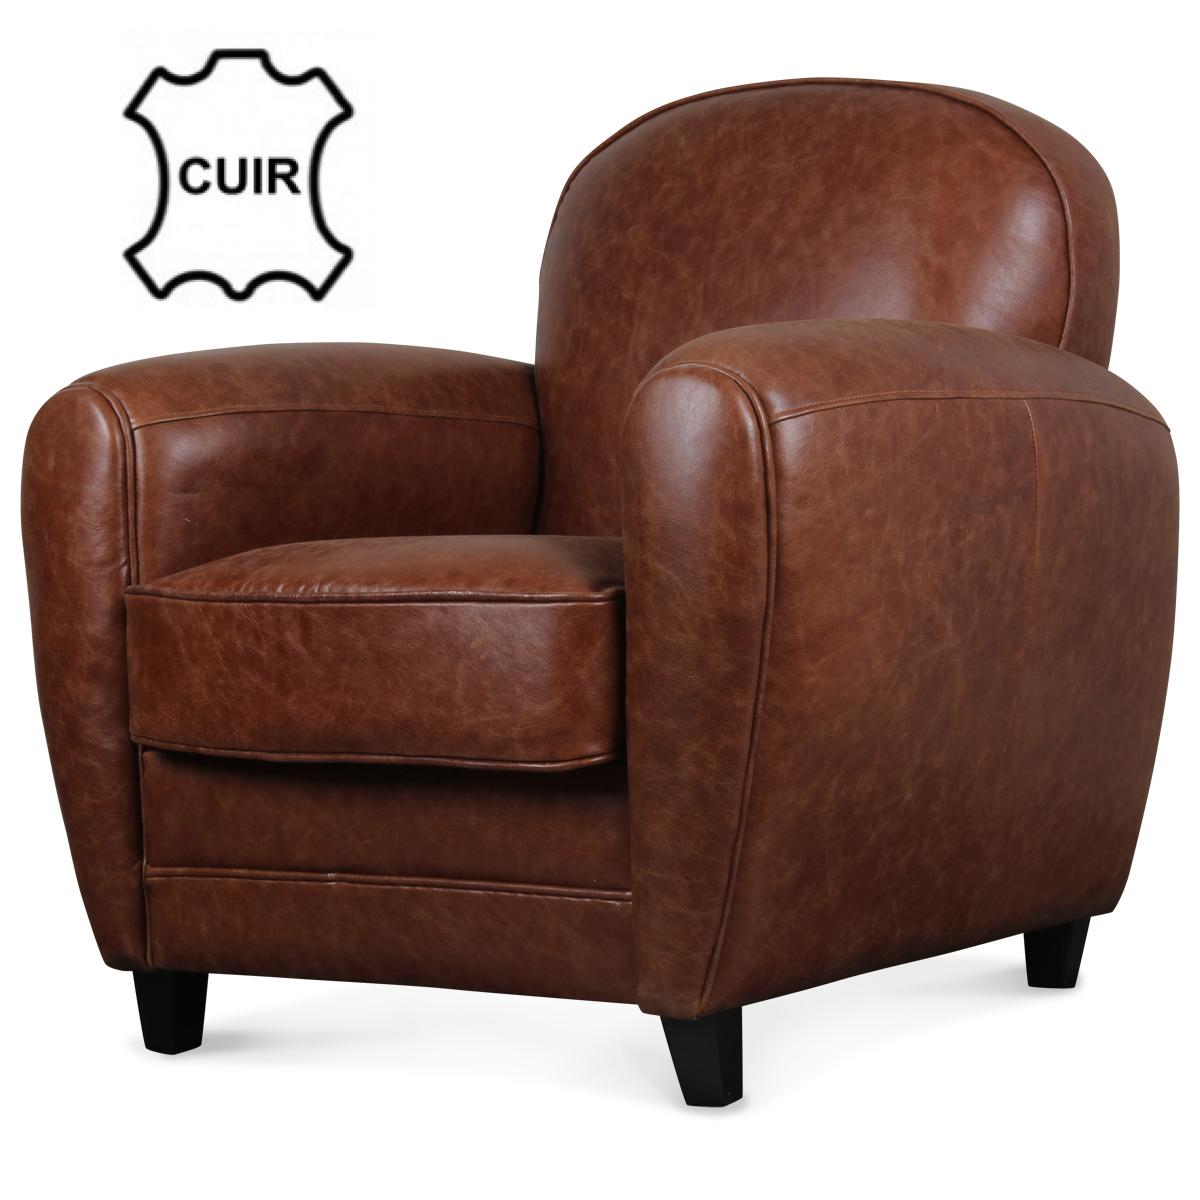 fauteuil club en cuir marron vintage industriel demeure et jardin. Black Bedroom Furniture Sets. Home Design Ideas